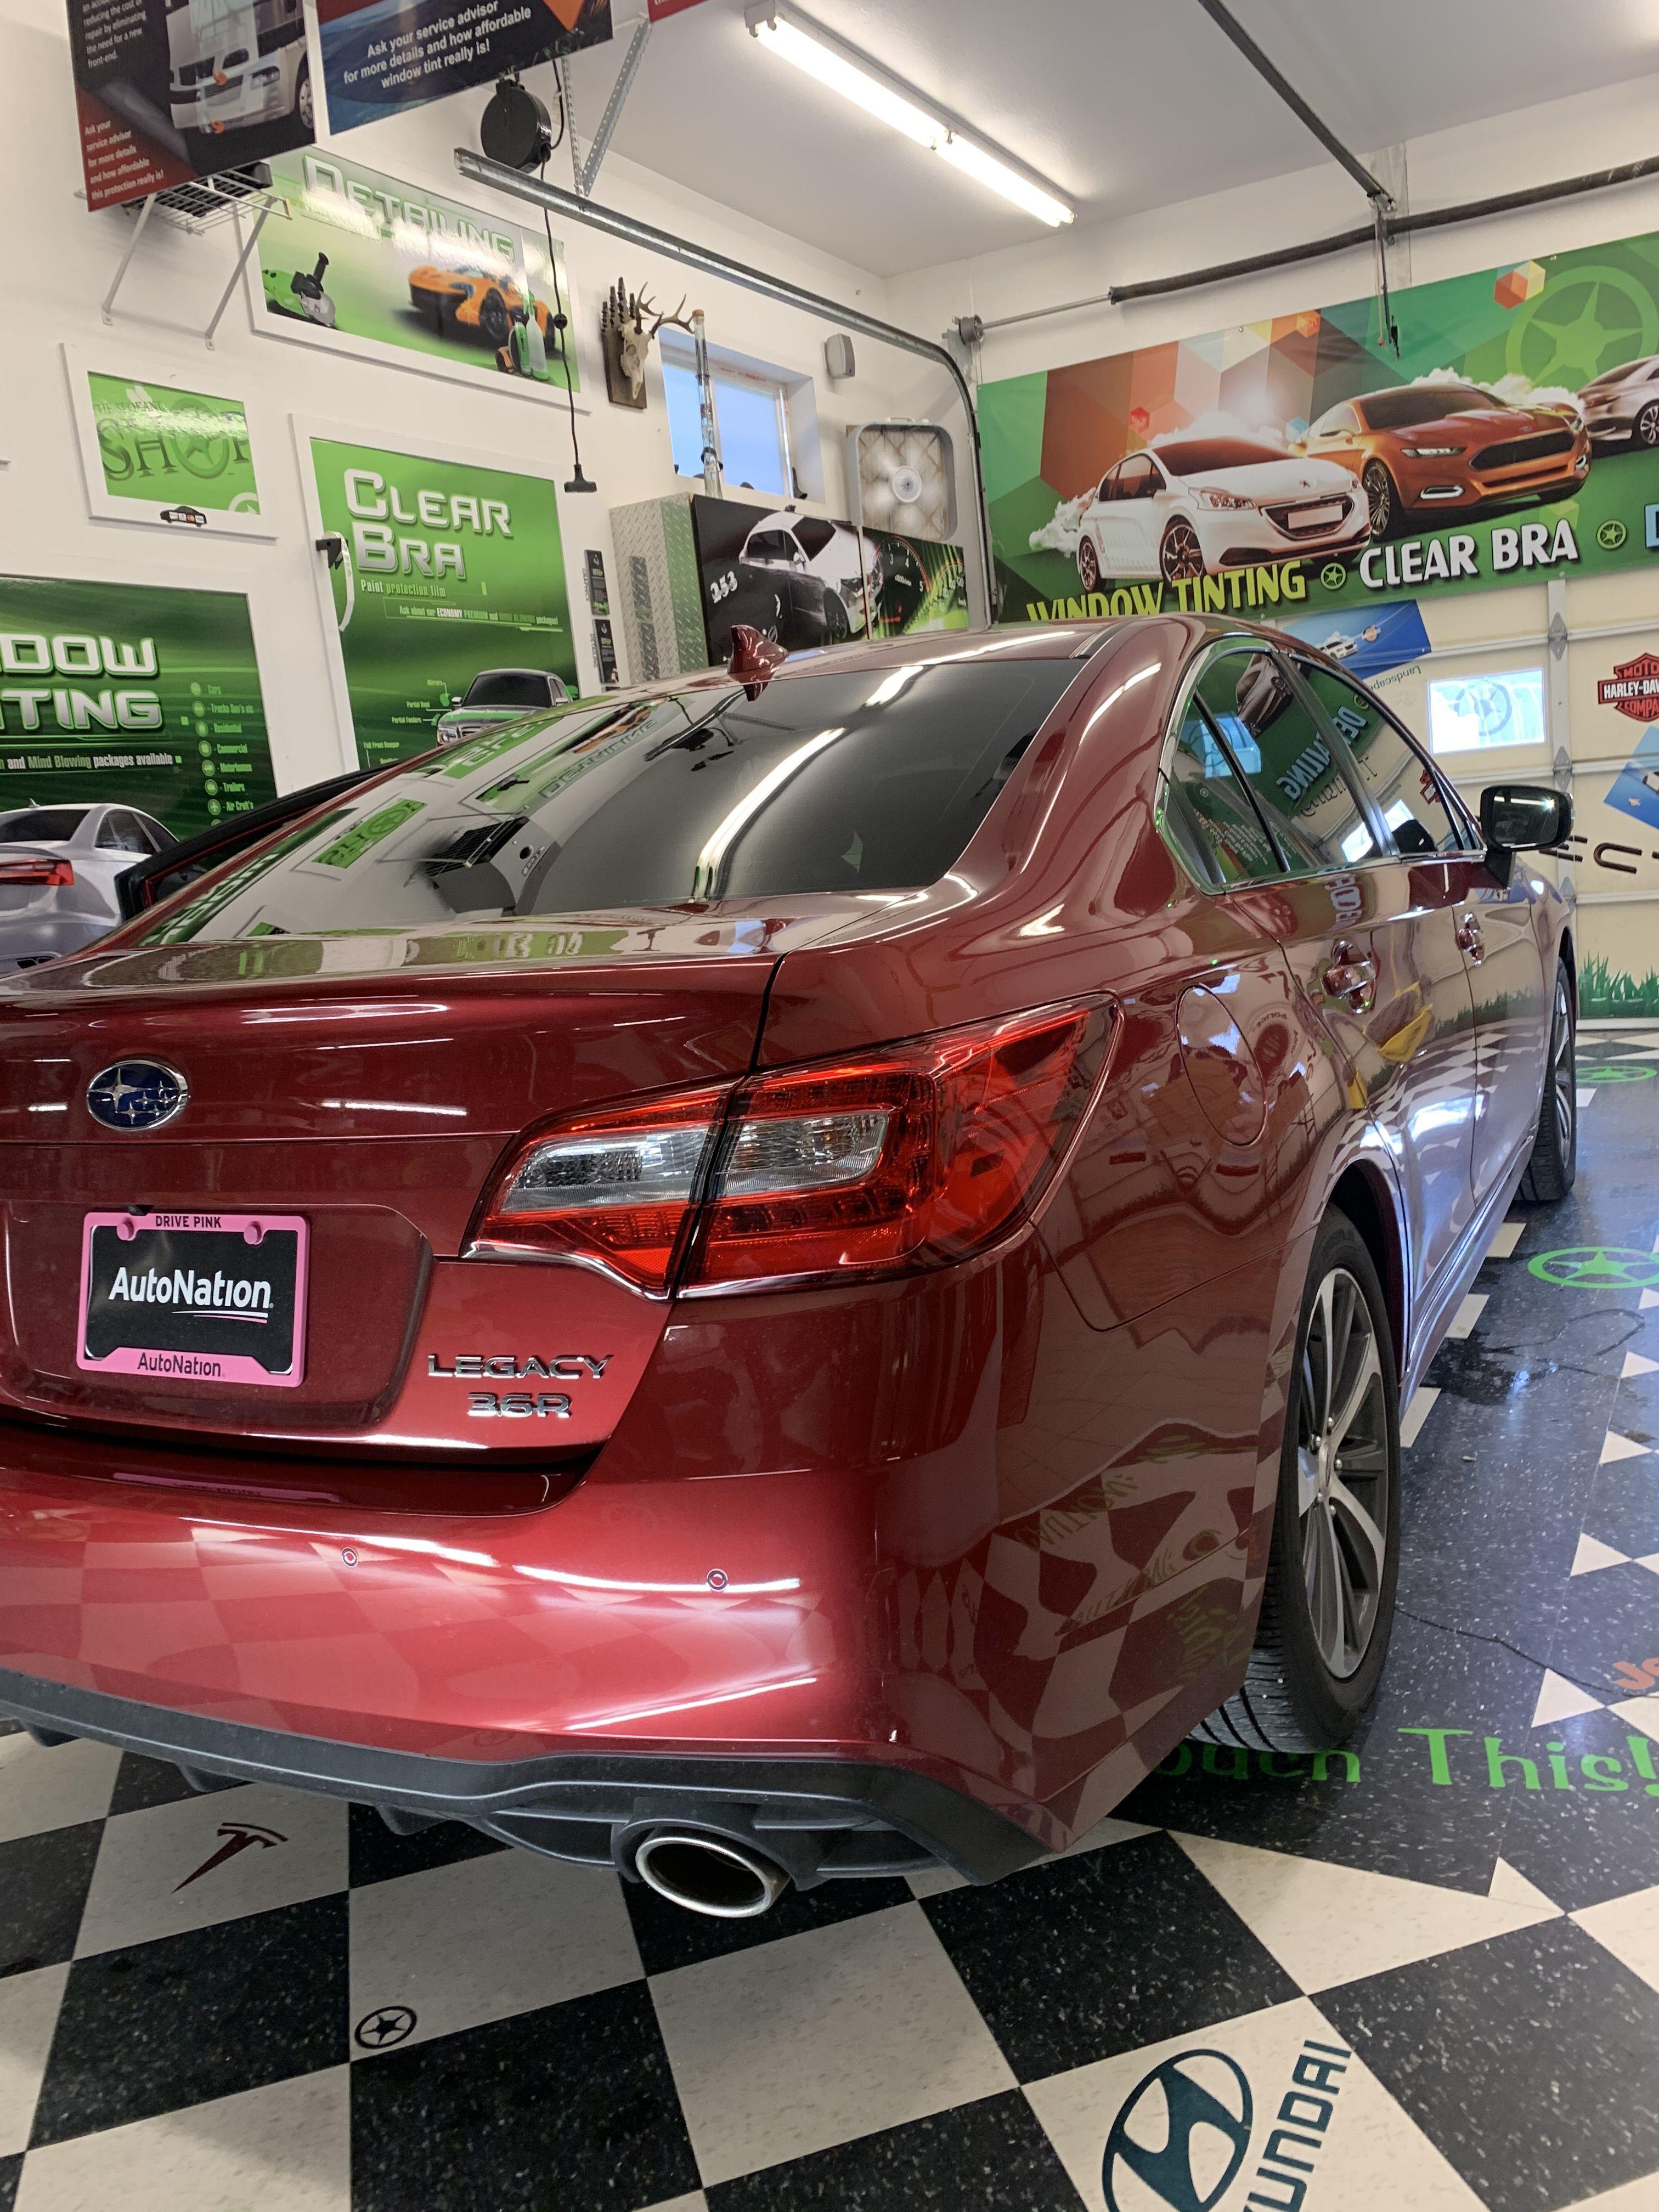 2019 Subaru Legacy Subaru Legacy Tinted Windows Clear Bra